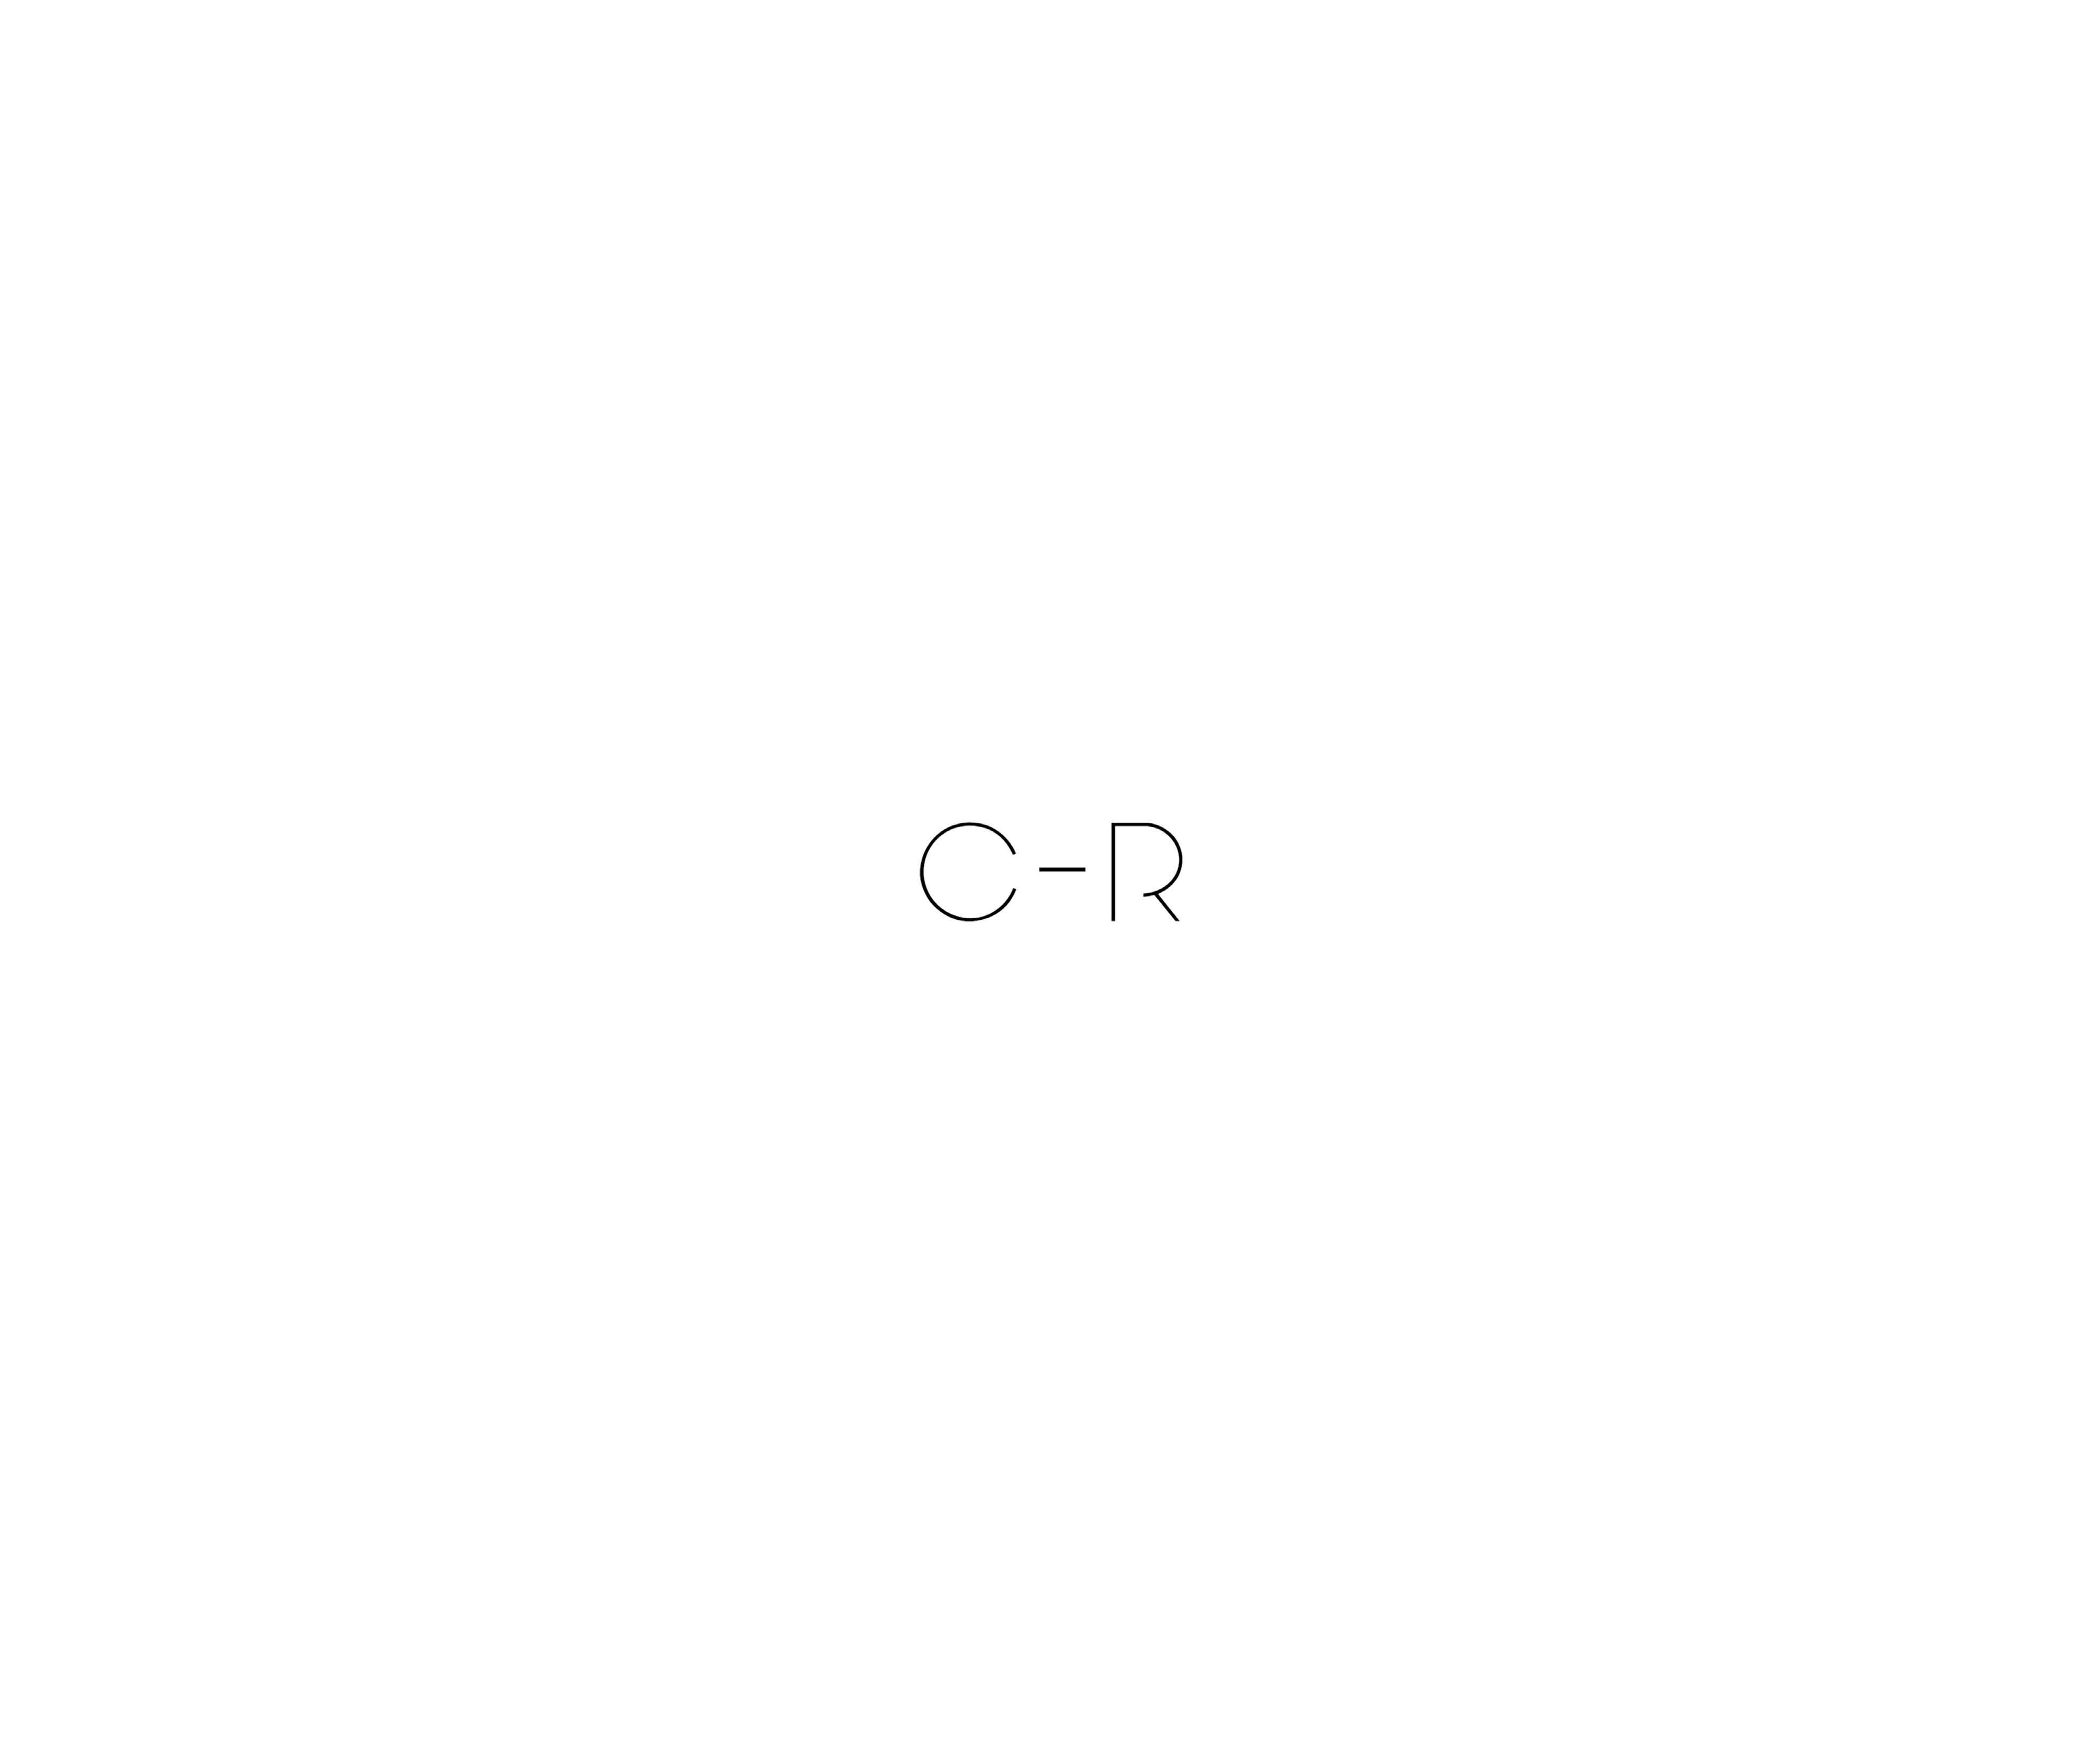 portfolio 3 FINAL_Page_075